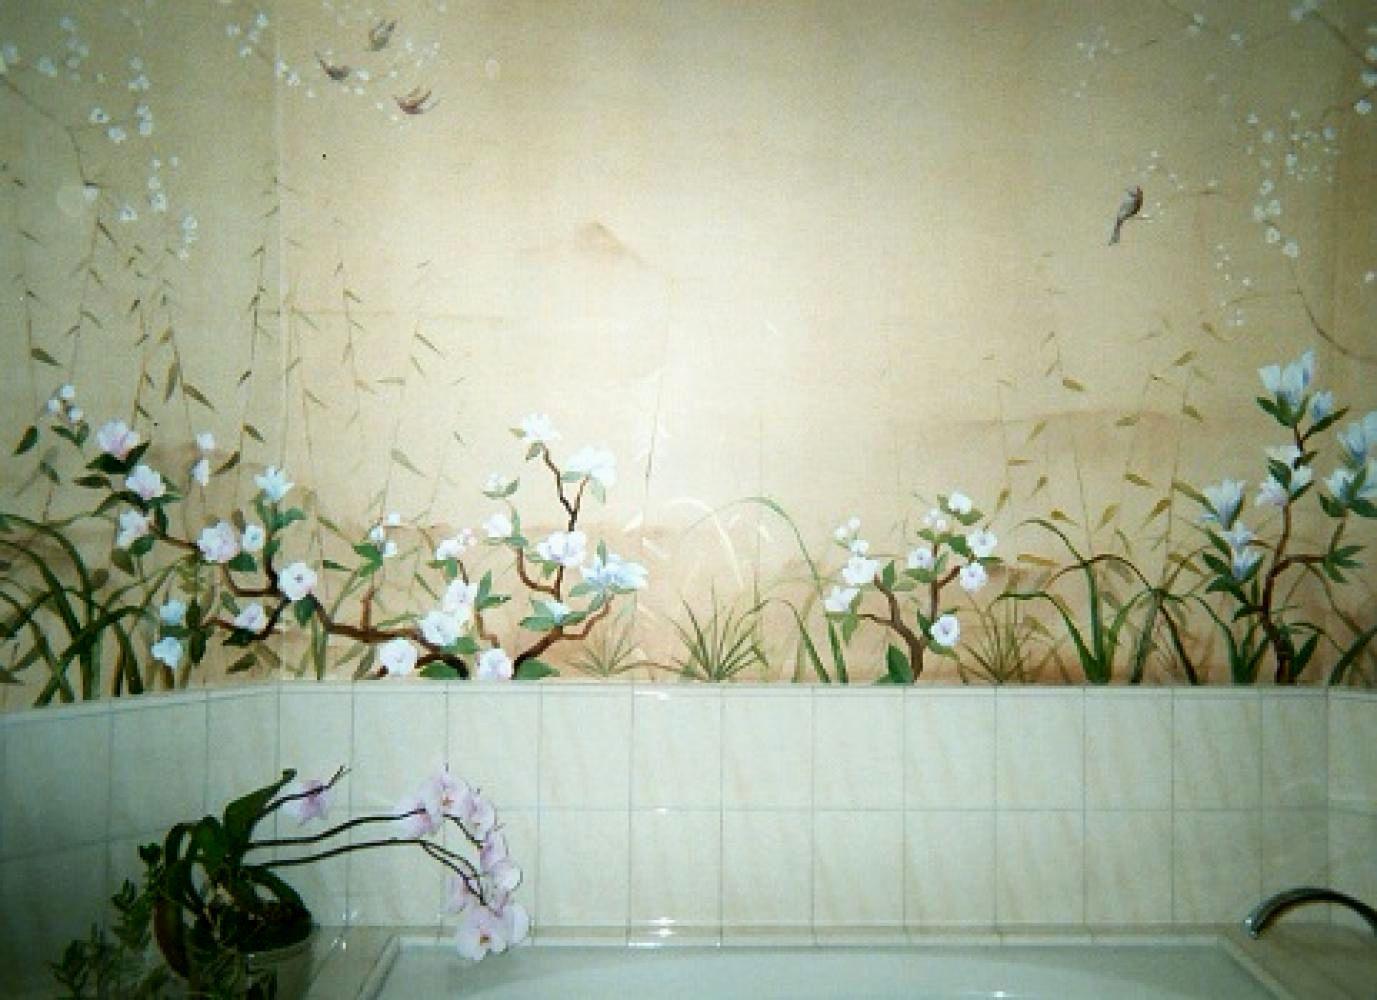 luxury jack and jill bathroom designs wallpaper-Fantastic Jack and Jill Bathroom Designs Architecture